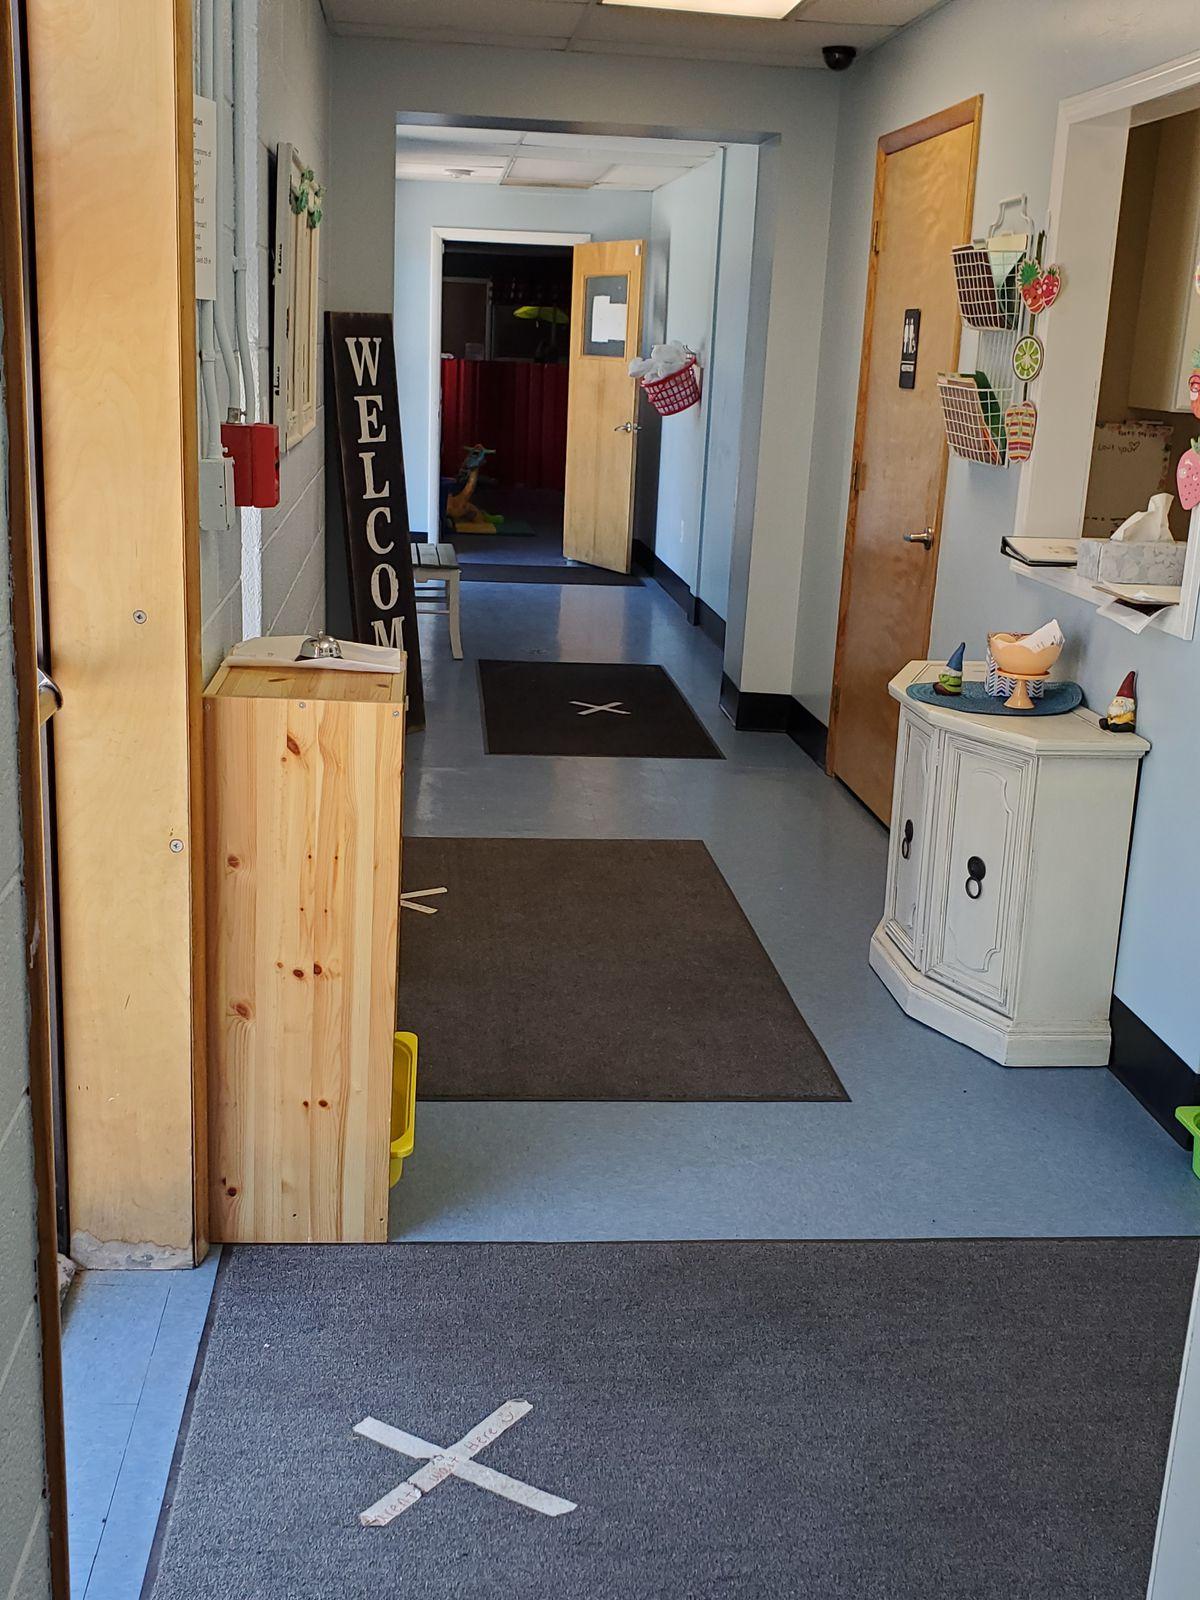 Xs taped in the entranceway of Li'l Graduates Child Development Center help prevent transmission of COVID-19 when children are dropped off.